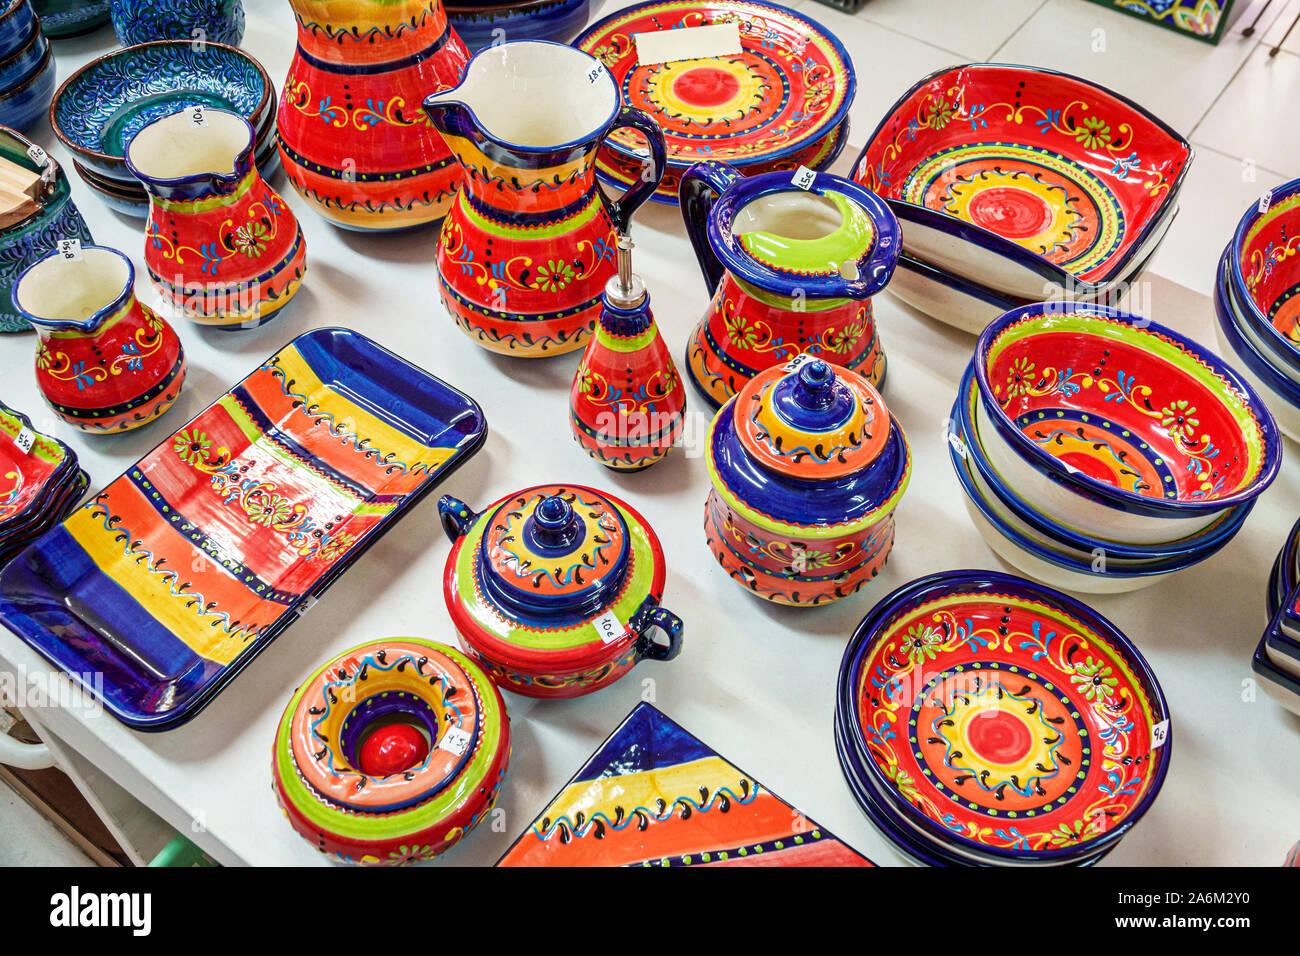 Valencia Spain Hispanic,Ciutat Vella,old city,historic center,Plaza Miracle del Mocadoret,Artesania Yuste,stores,shopping,display sale,handicrafts,art Stock Photo